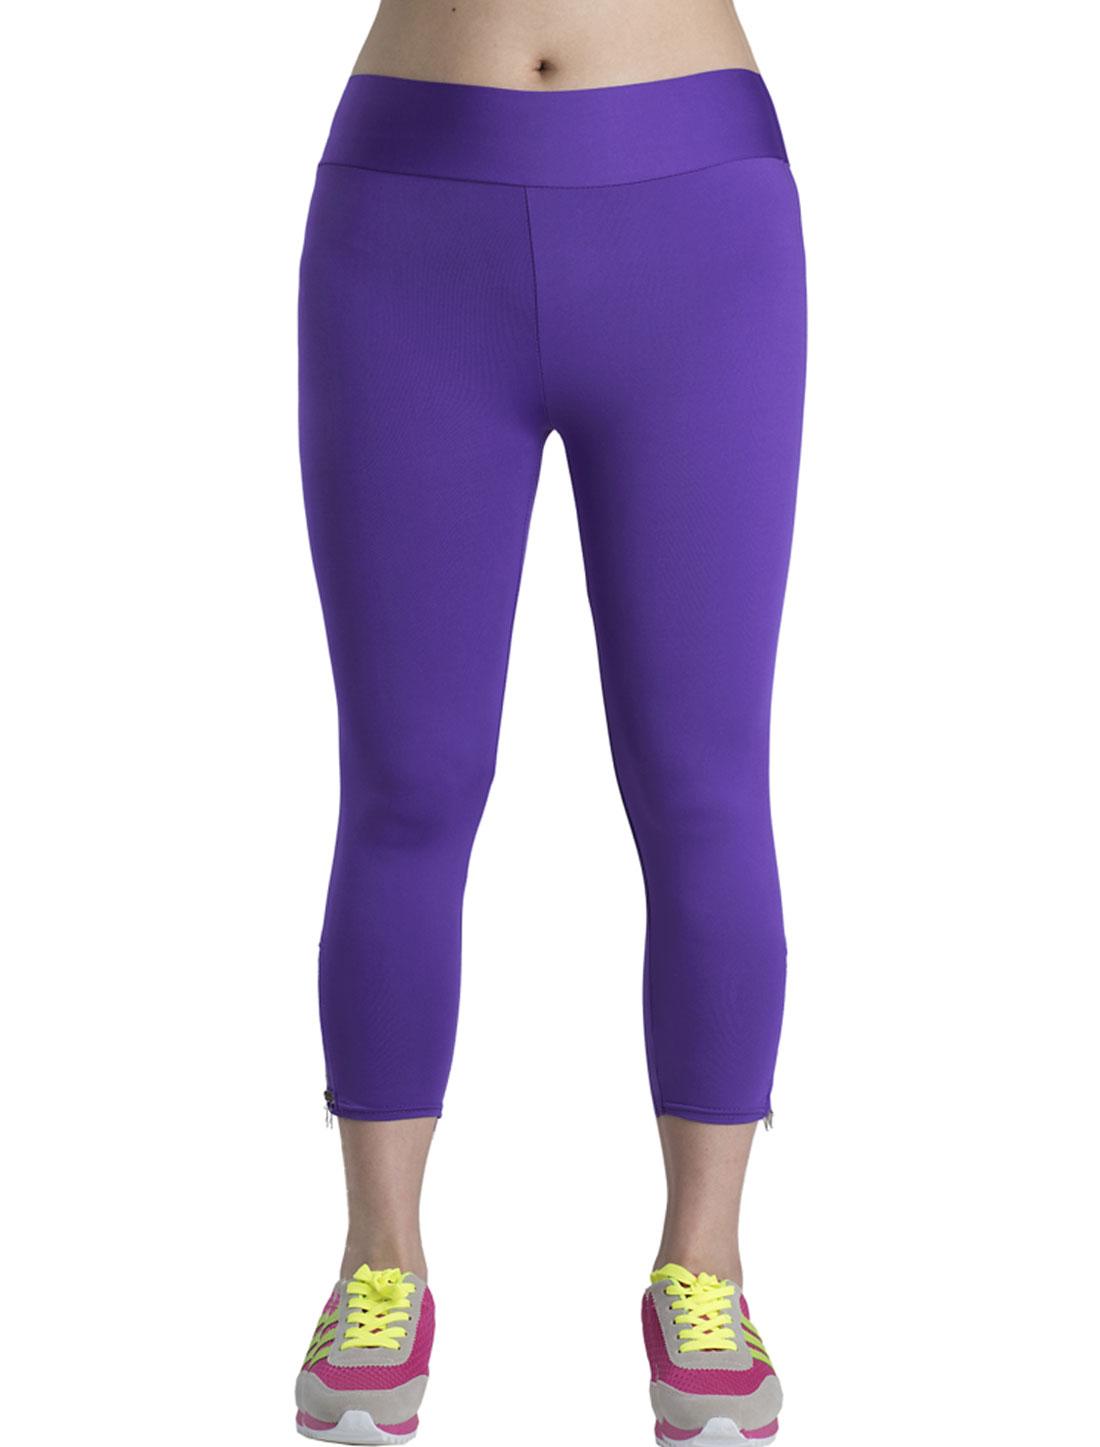 Lady Zip Closure Side Design Slim Fit Capri Pants Purpel M